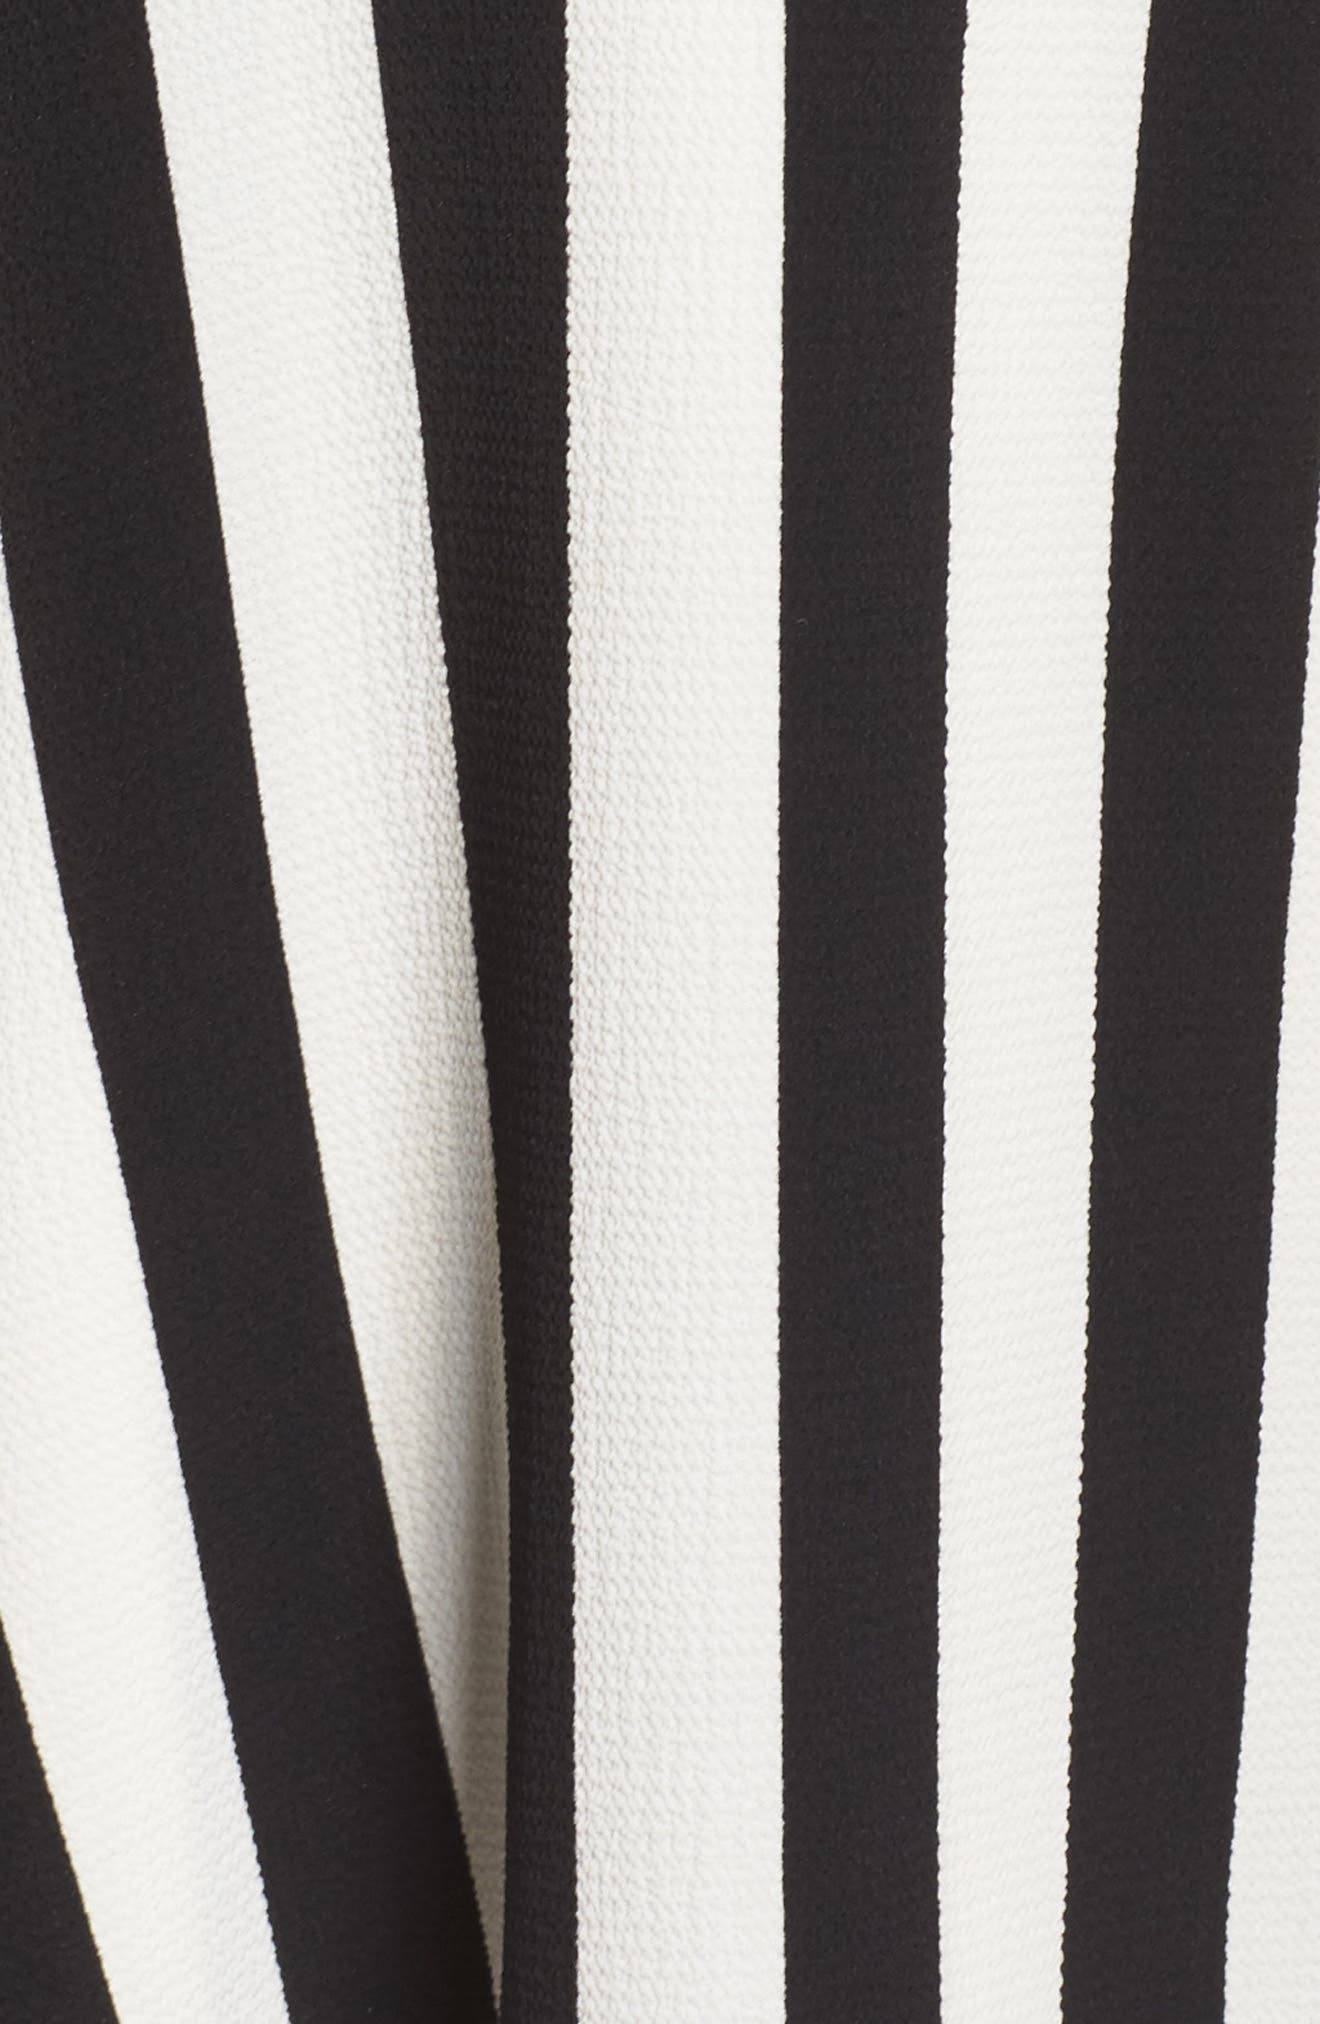 Spectator Asymmetrical Hem Dress,                             Alternate thumbnail 5, color,                             RICH BLACK